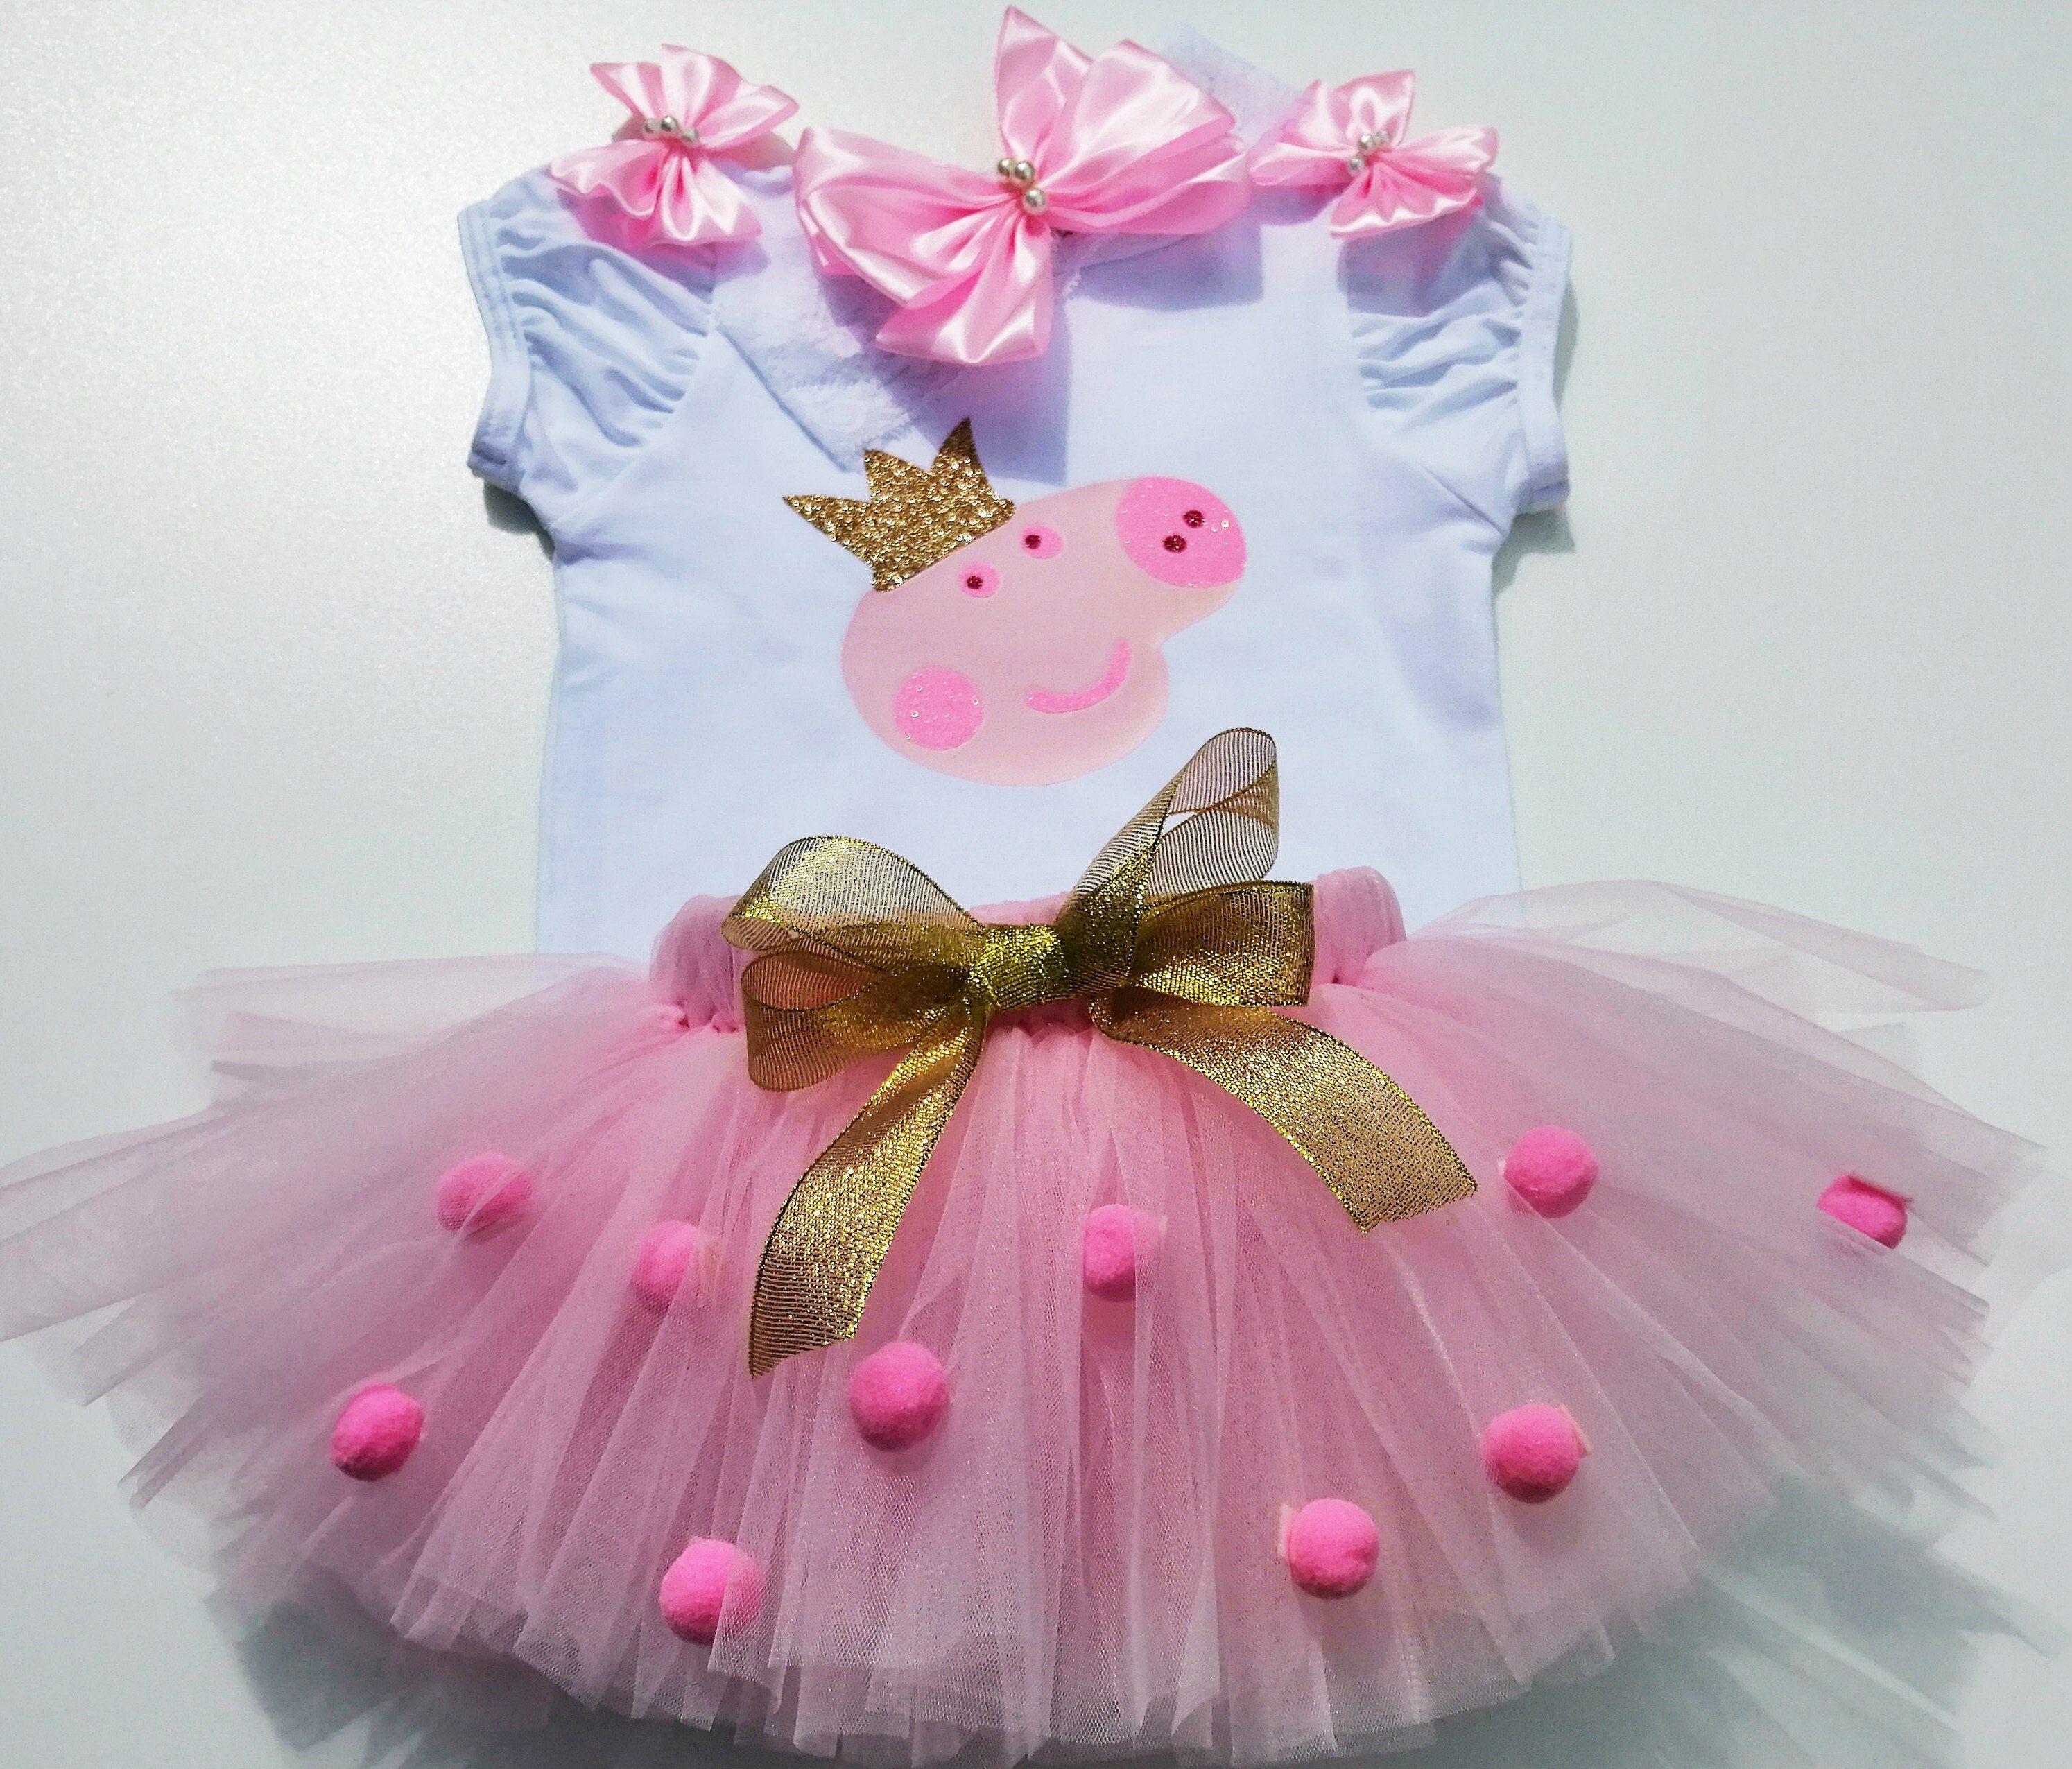 25+ Peppa pig birthday dress ideas